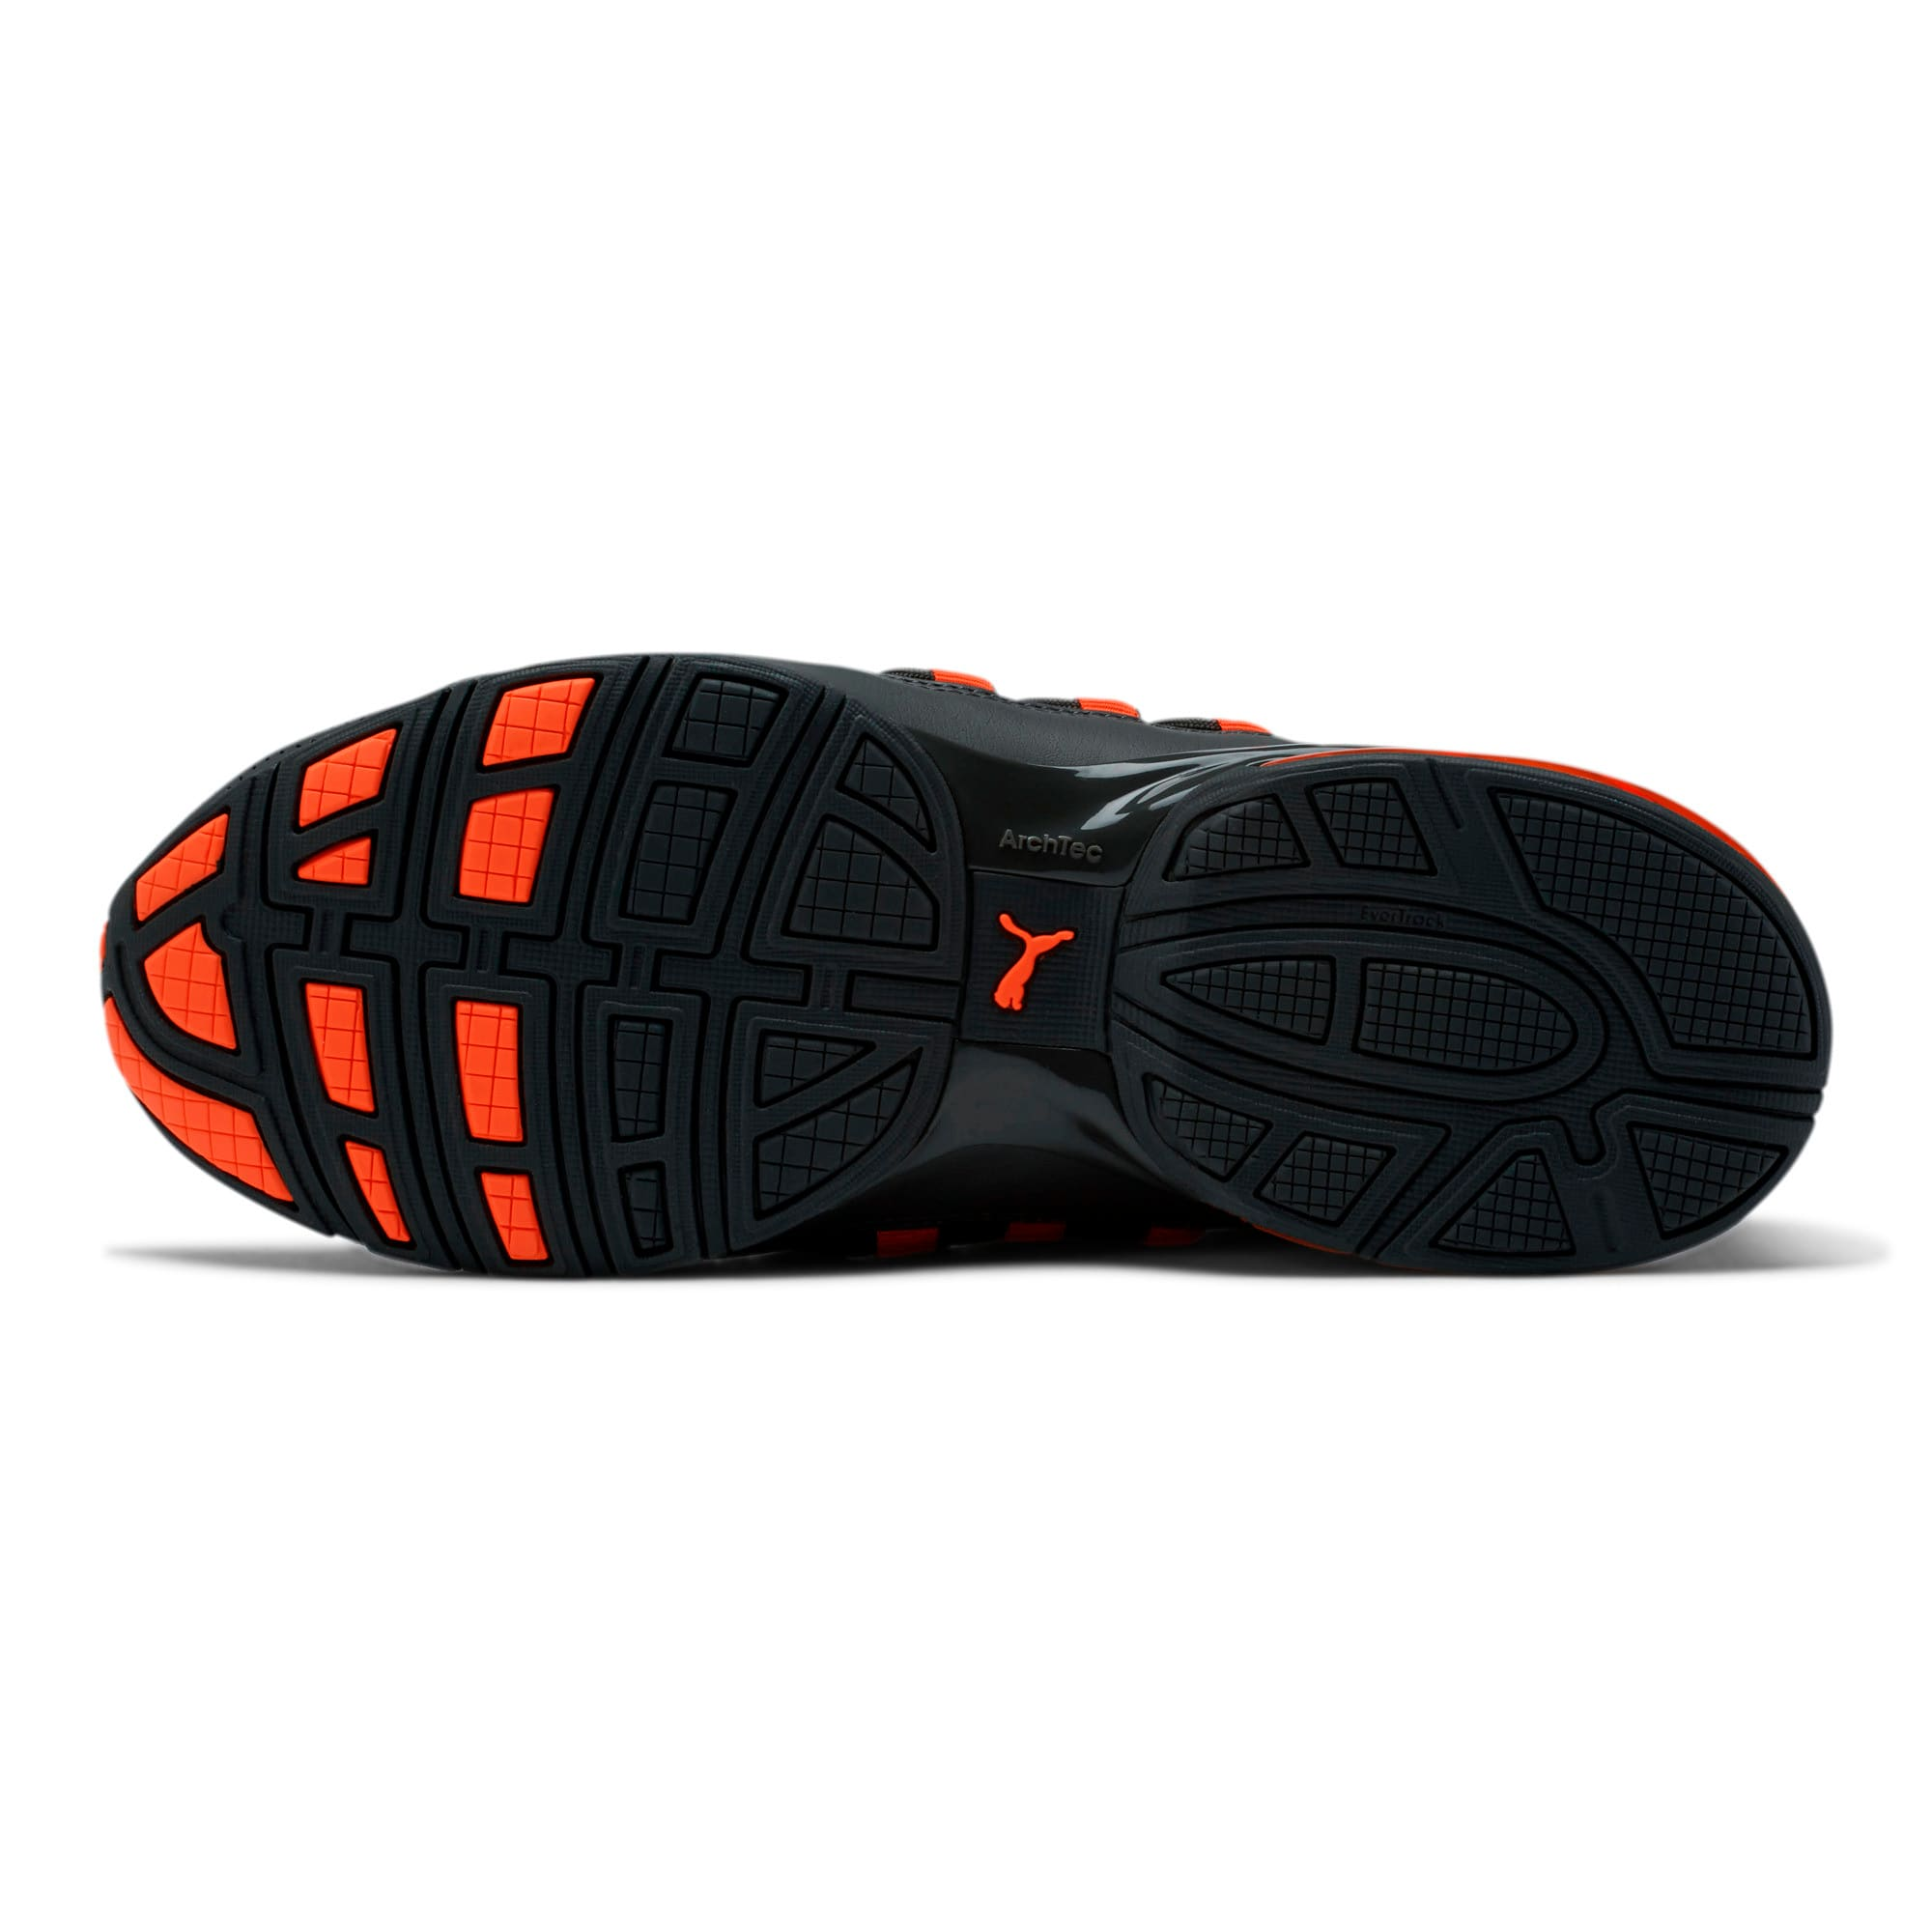 Thumbnail 4 of Cell Regulate Men's Running Shoes, Dark Shadow-Nrgy Red, medium